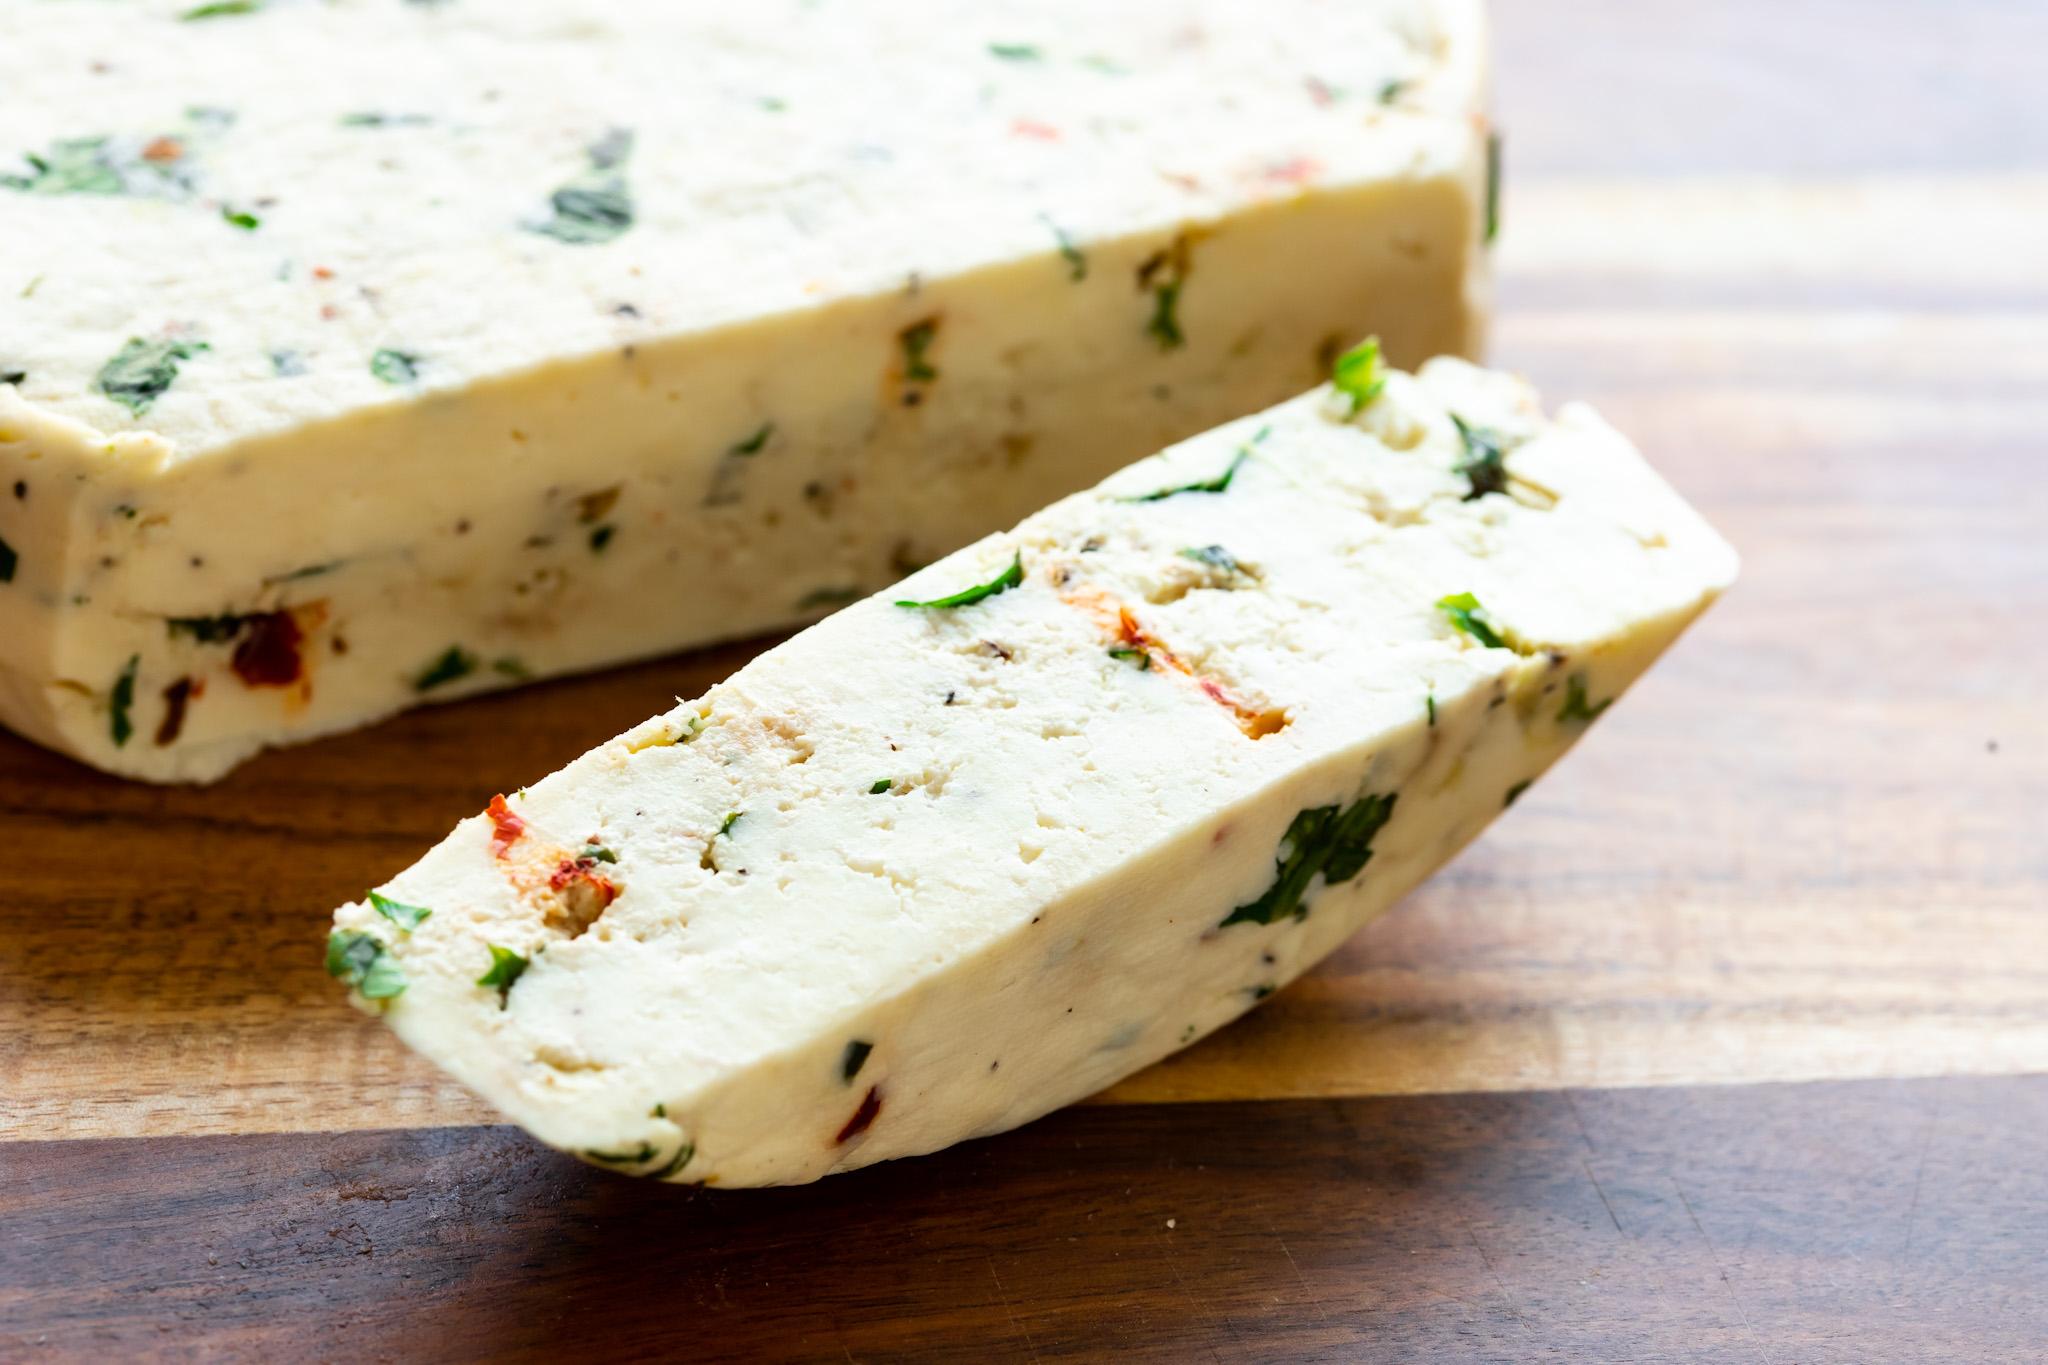 Homemade Masala Paneer Soft